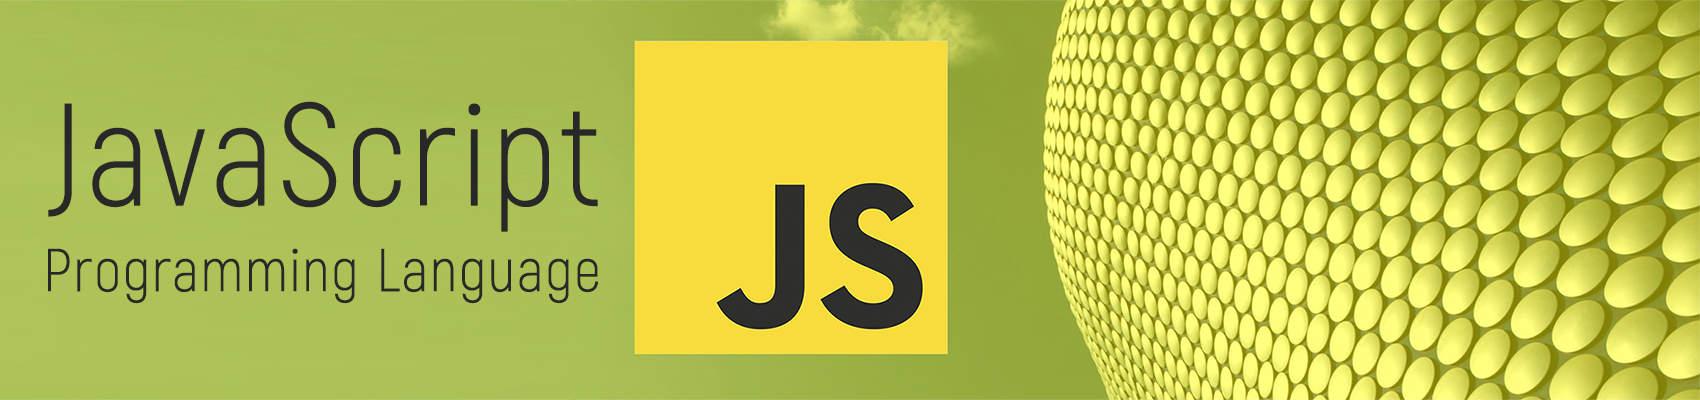 JavaScript web application development company